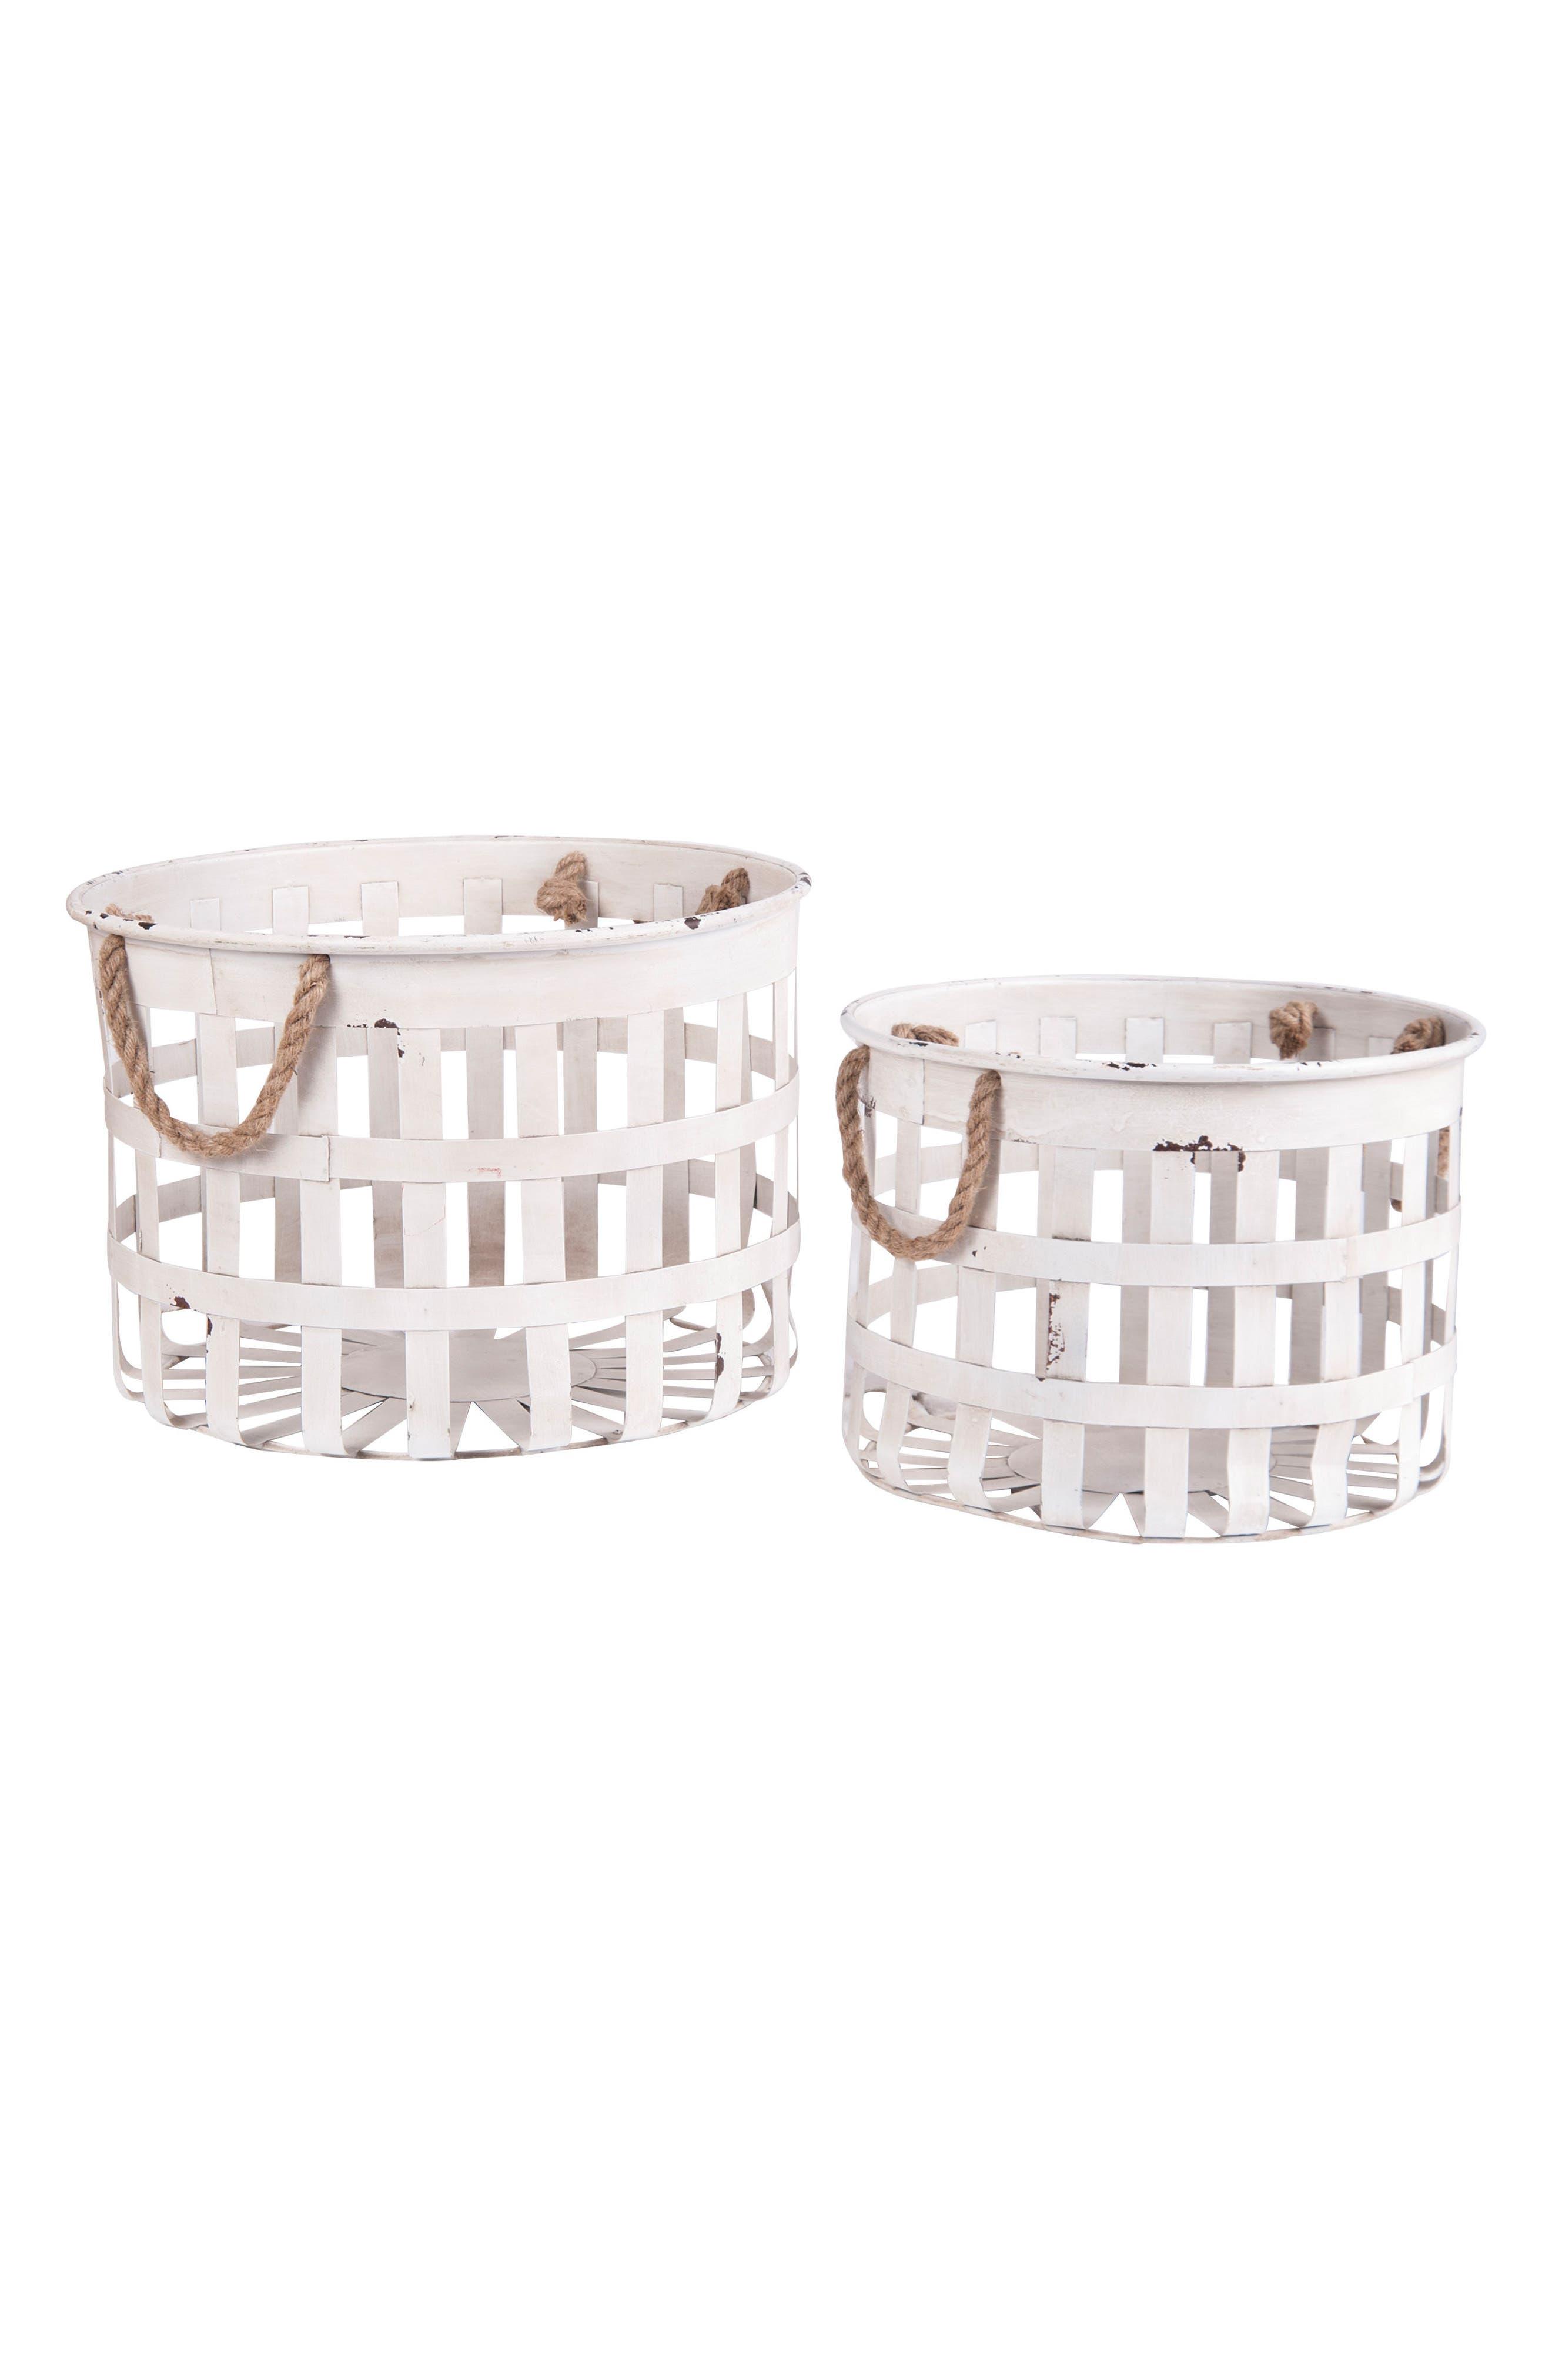 Set of 2 Nesting Baskets,                             Main thumbnail 1, color,                             Metal/ Rope